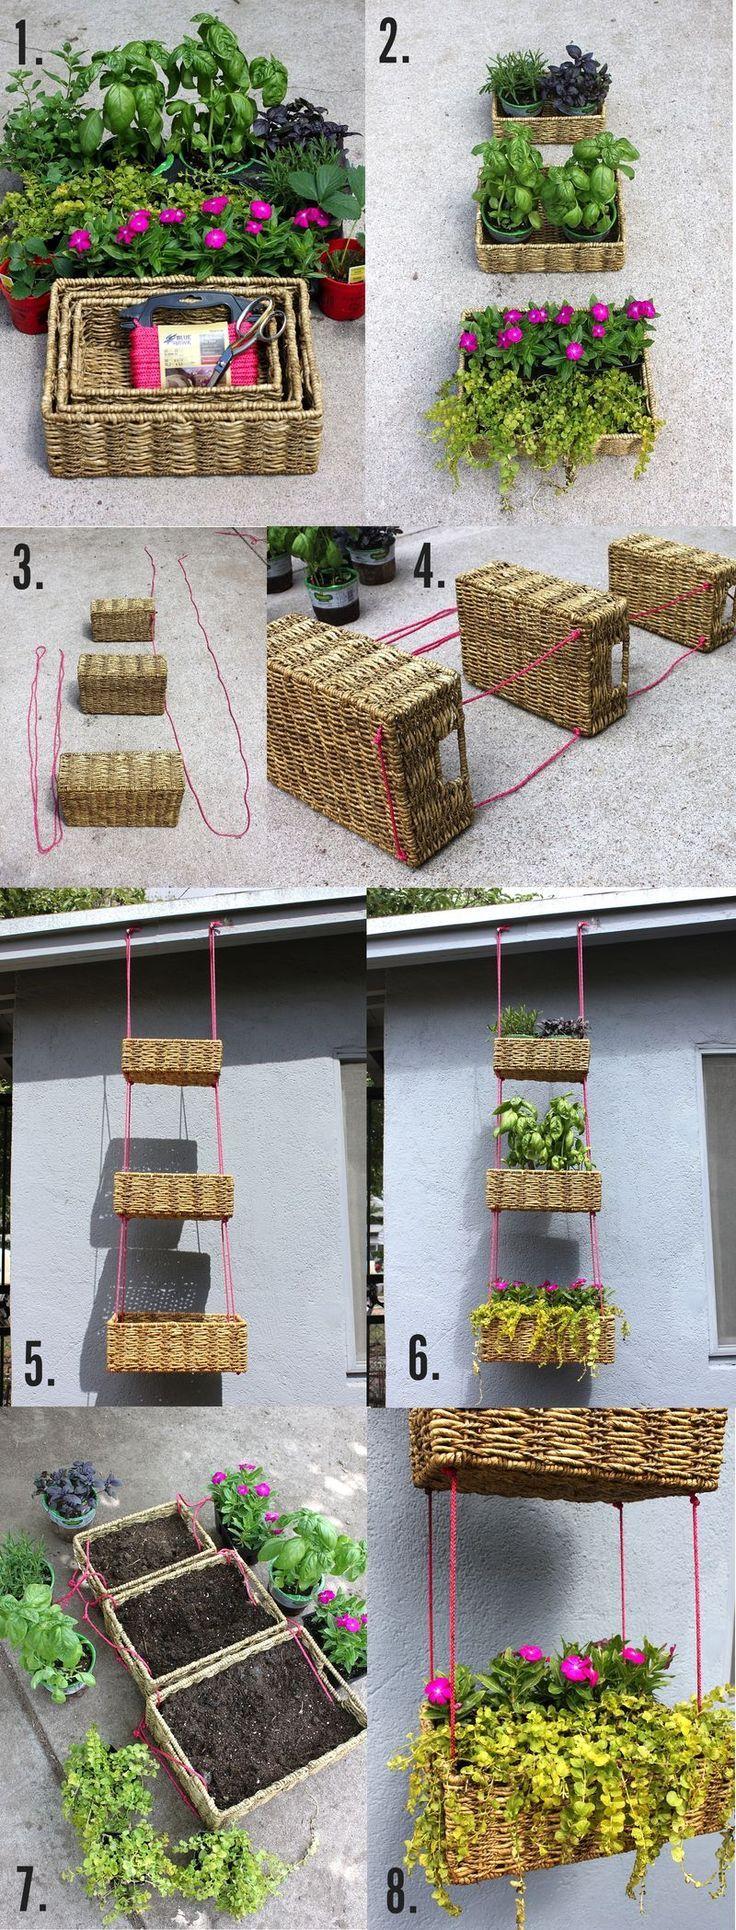 best baskets images on pinterest basket wicker baskets and crafts